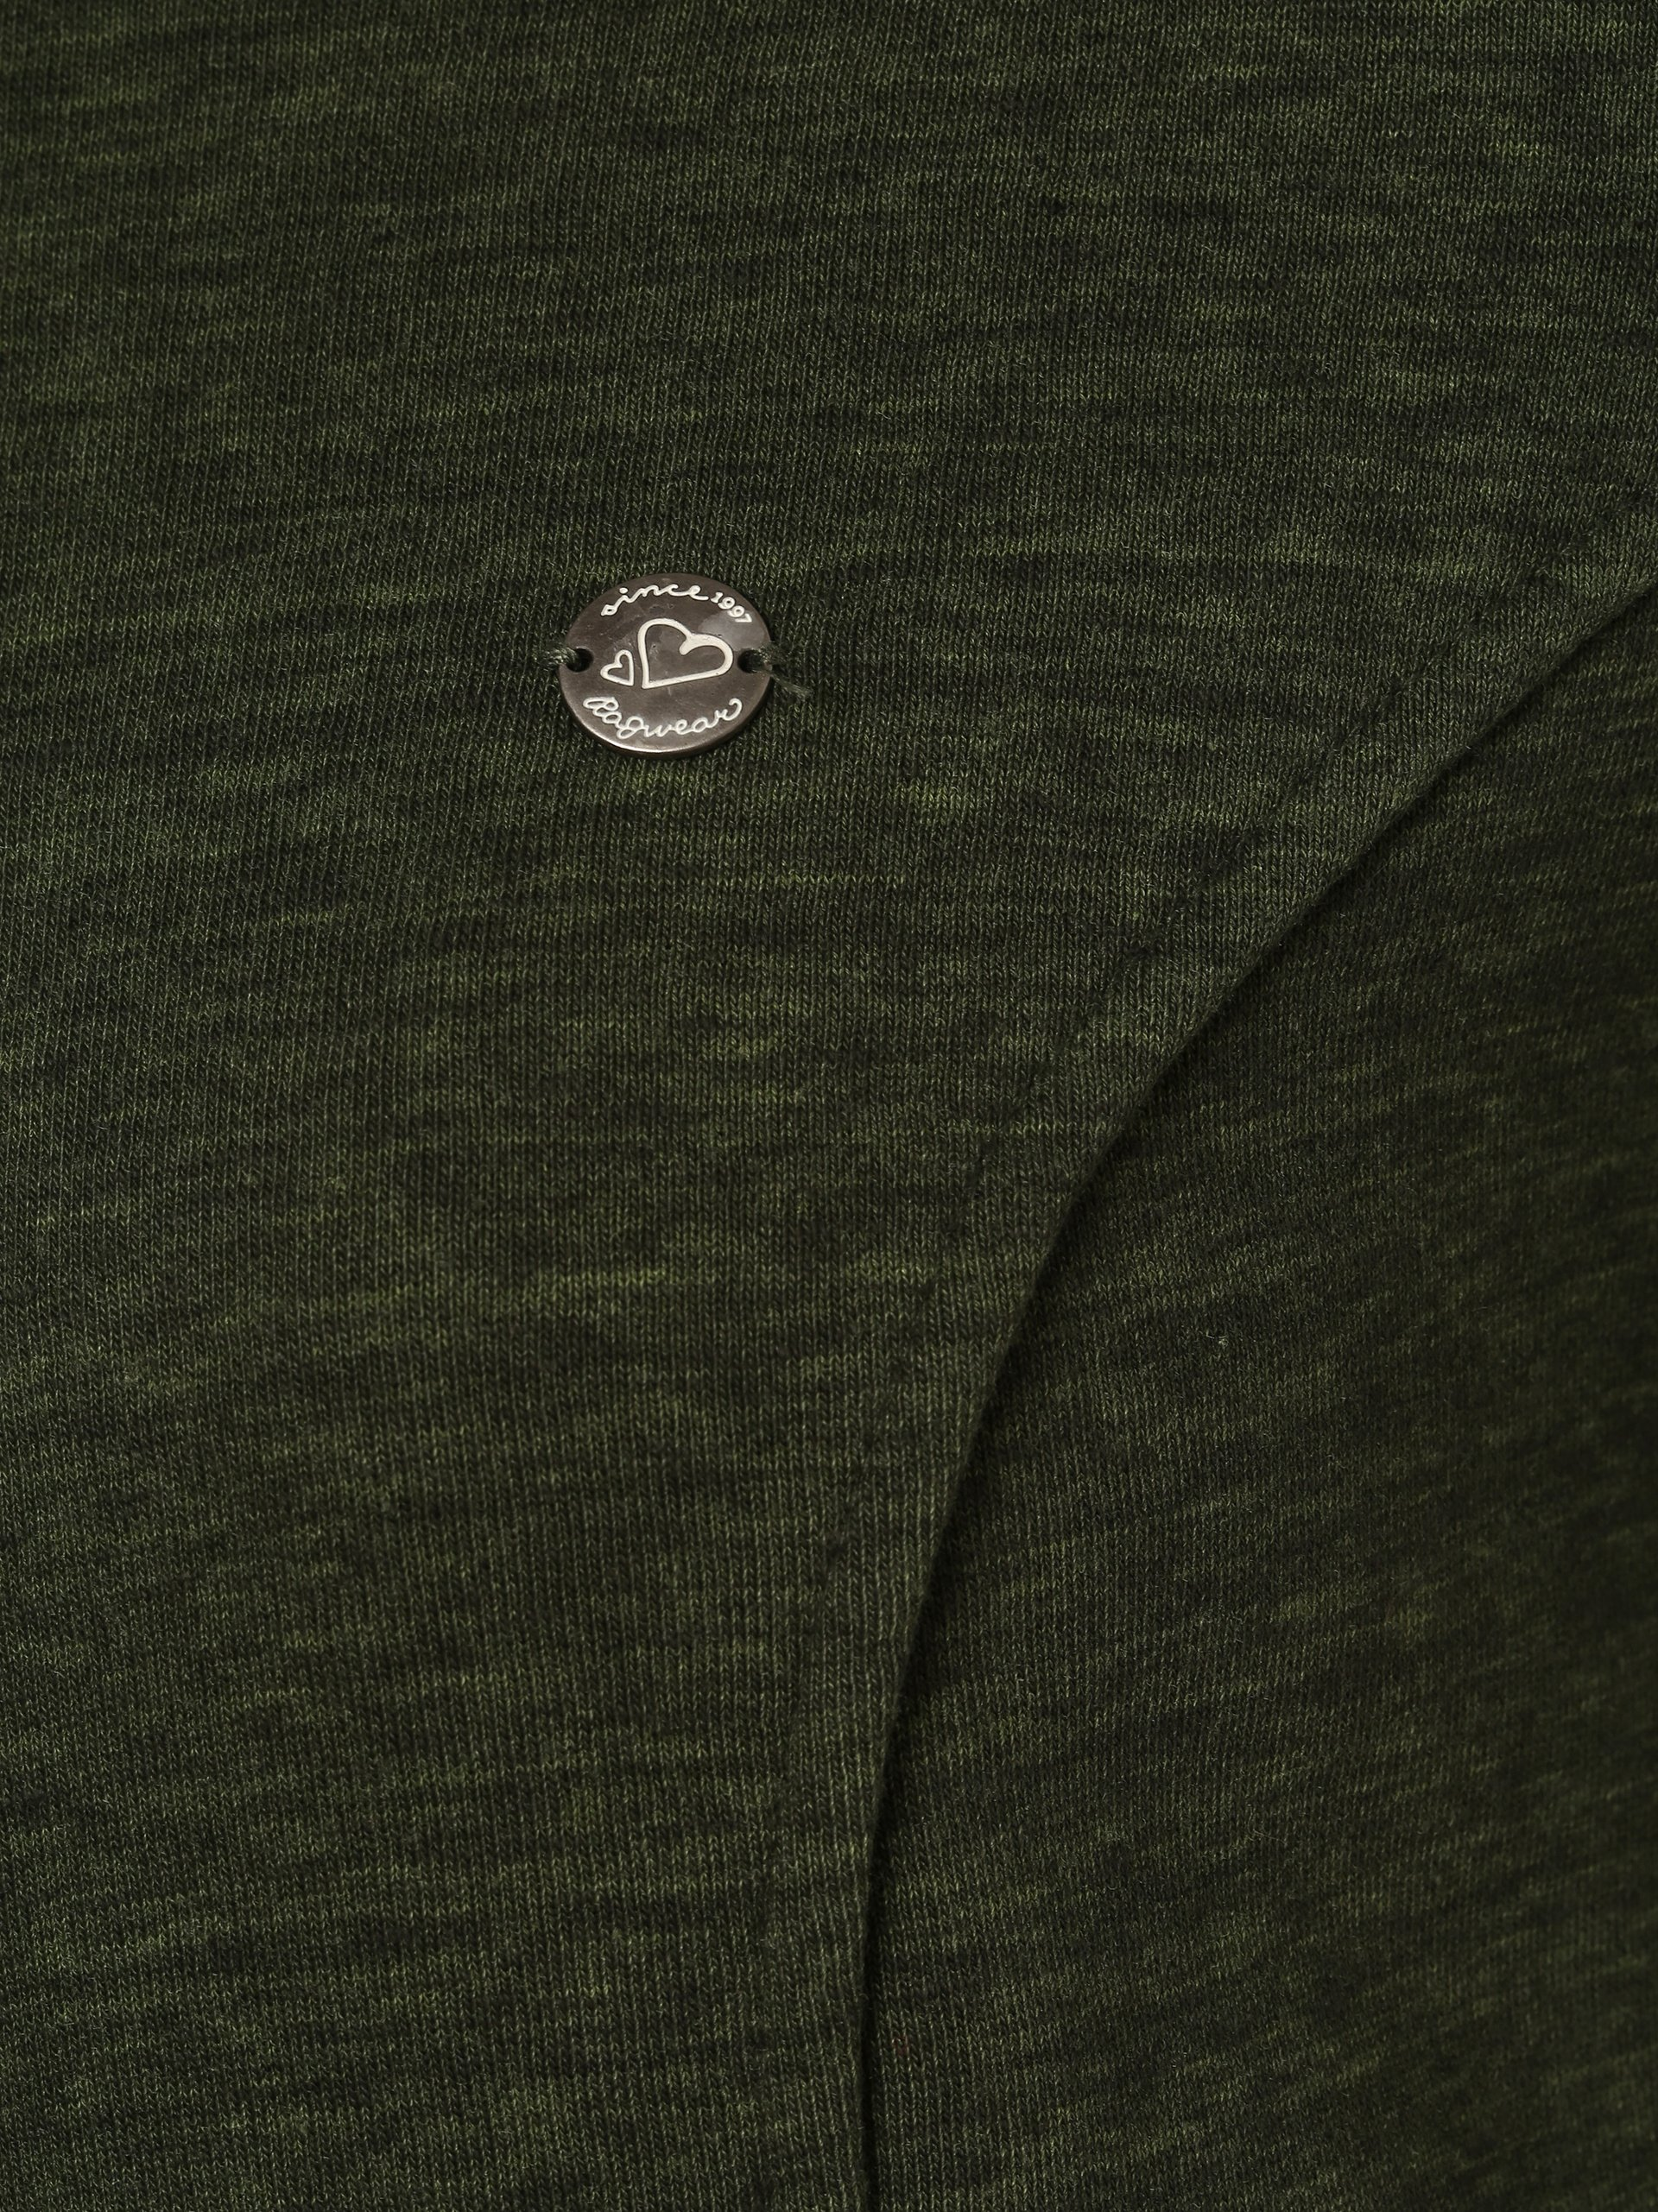 Ragwear Damska bluza rozpinana – Letty